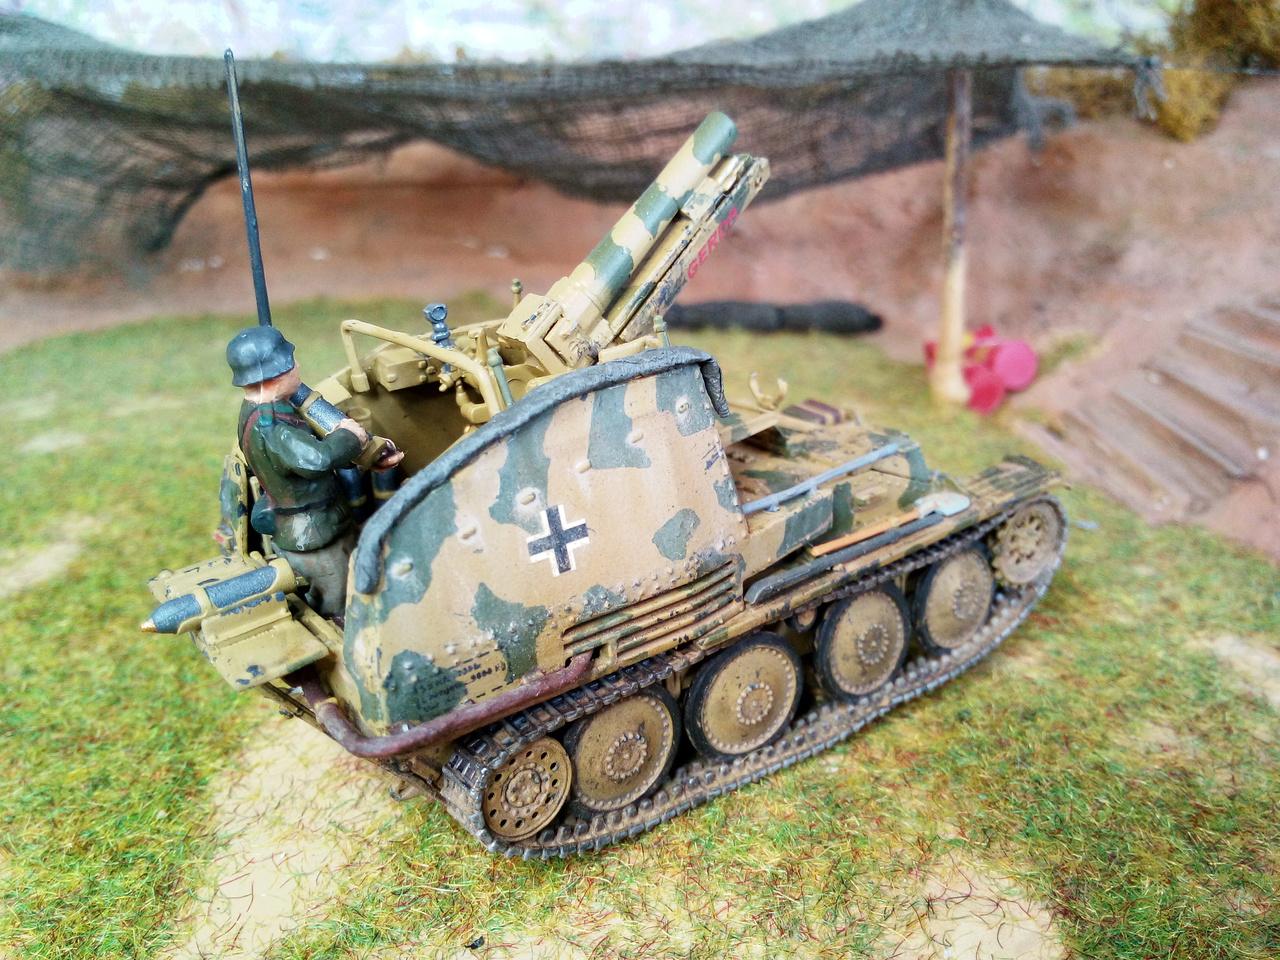 Beiträge Rüstungsspirale #80 März 2021: Artillerie Img_20210328_10250189kyi